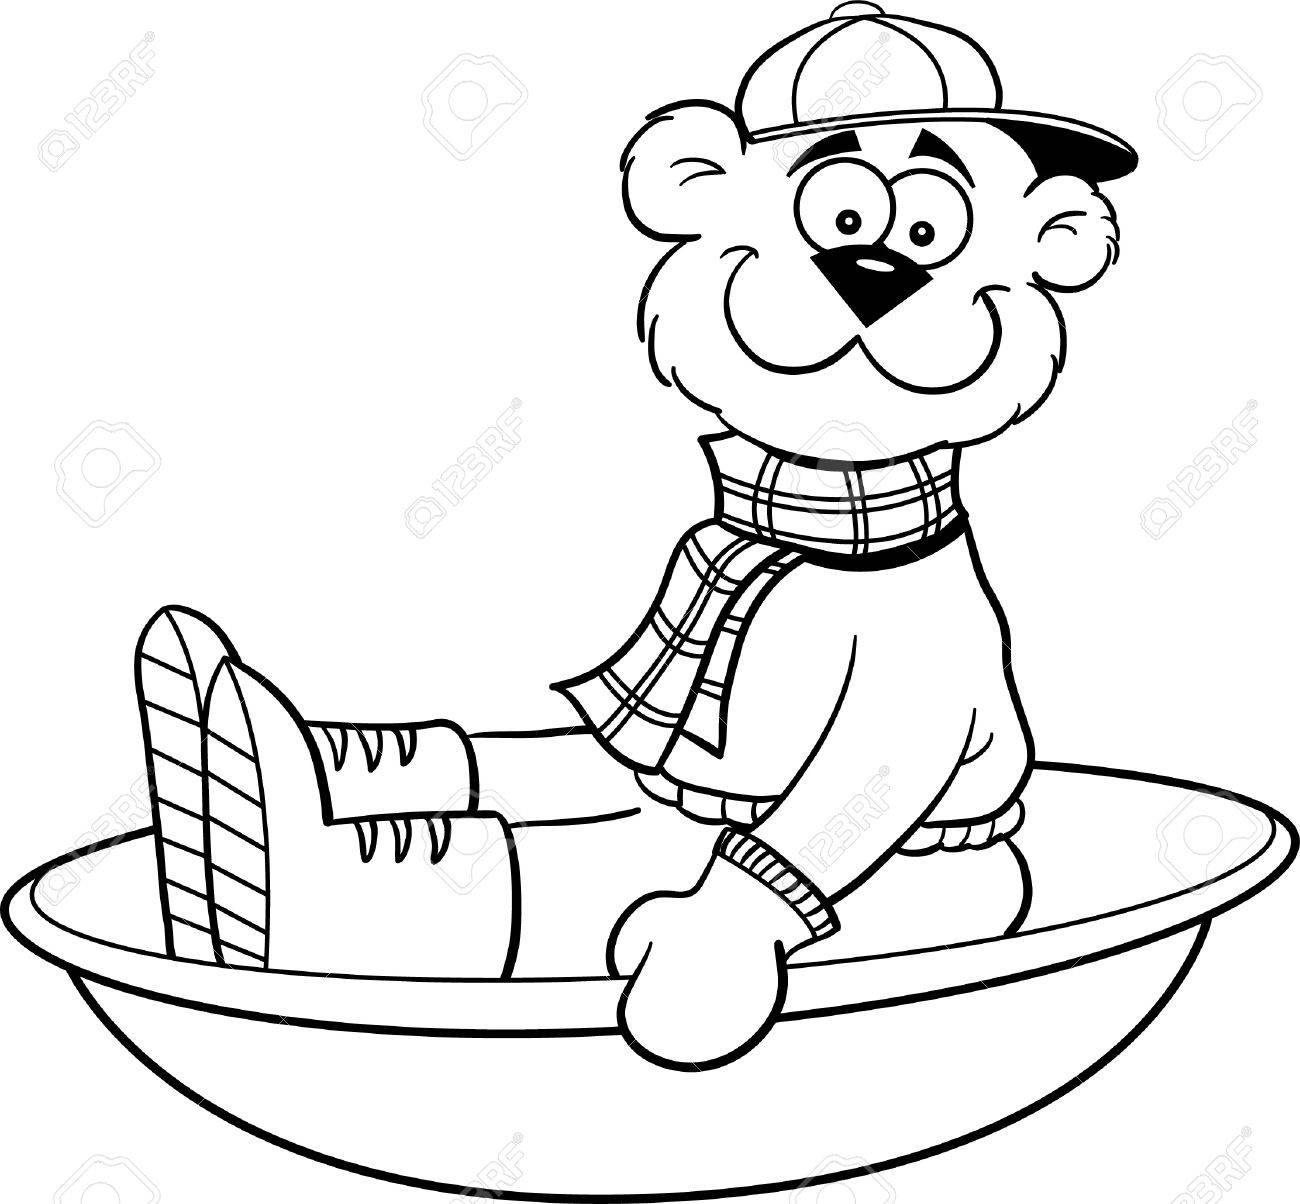 black and white illustration of a bear sledding royalty free